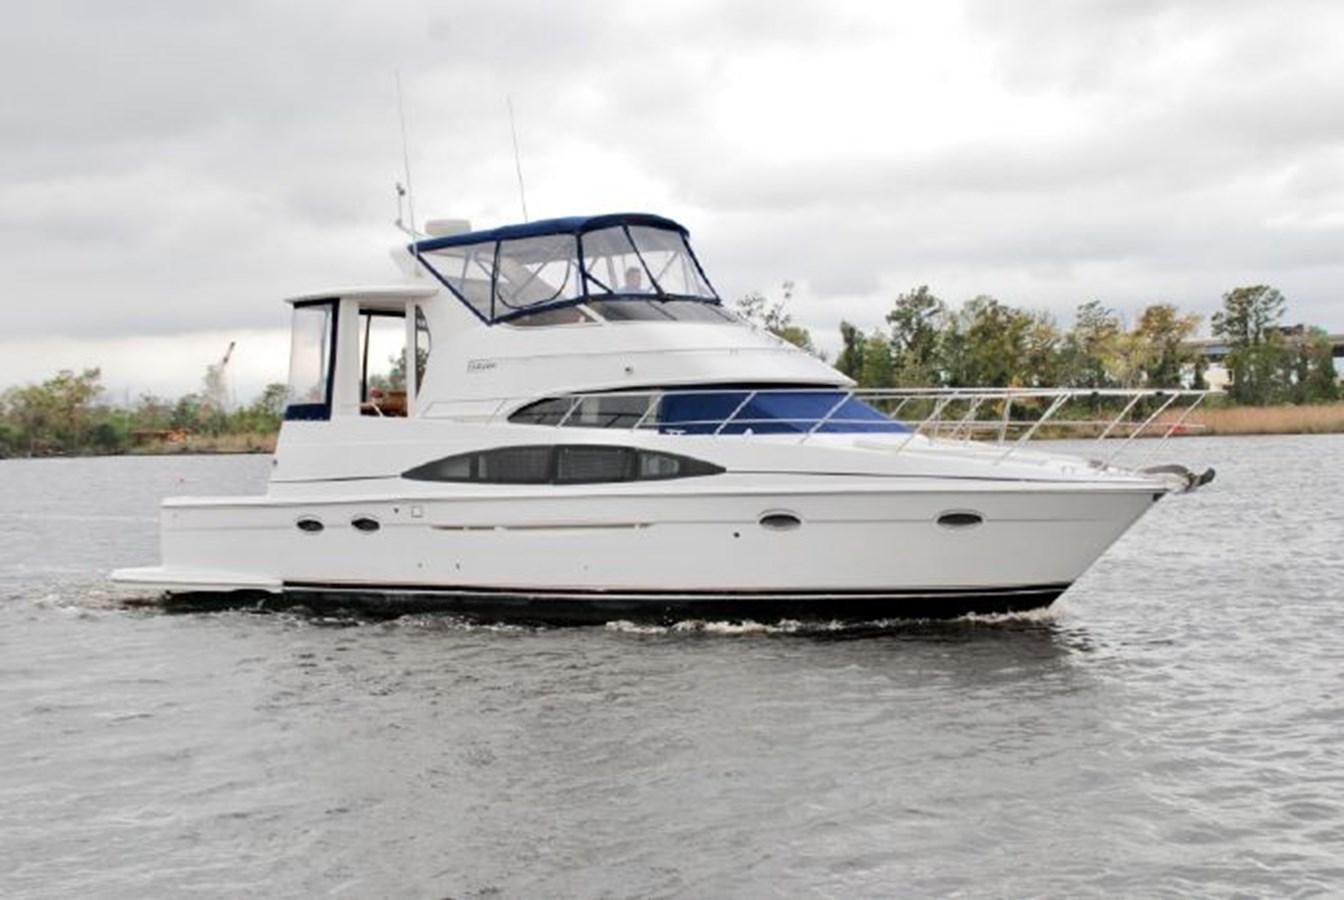 67 2001 CARVER 444 Cockpit Motor yacht Motor Yacht 2885843